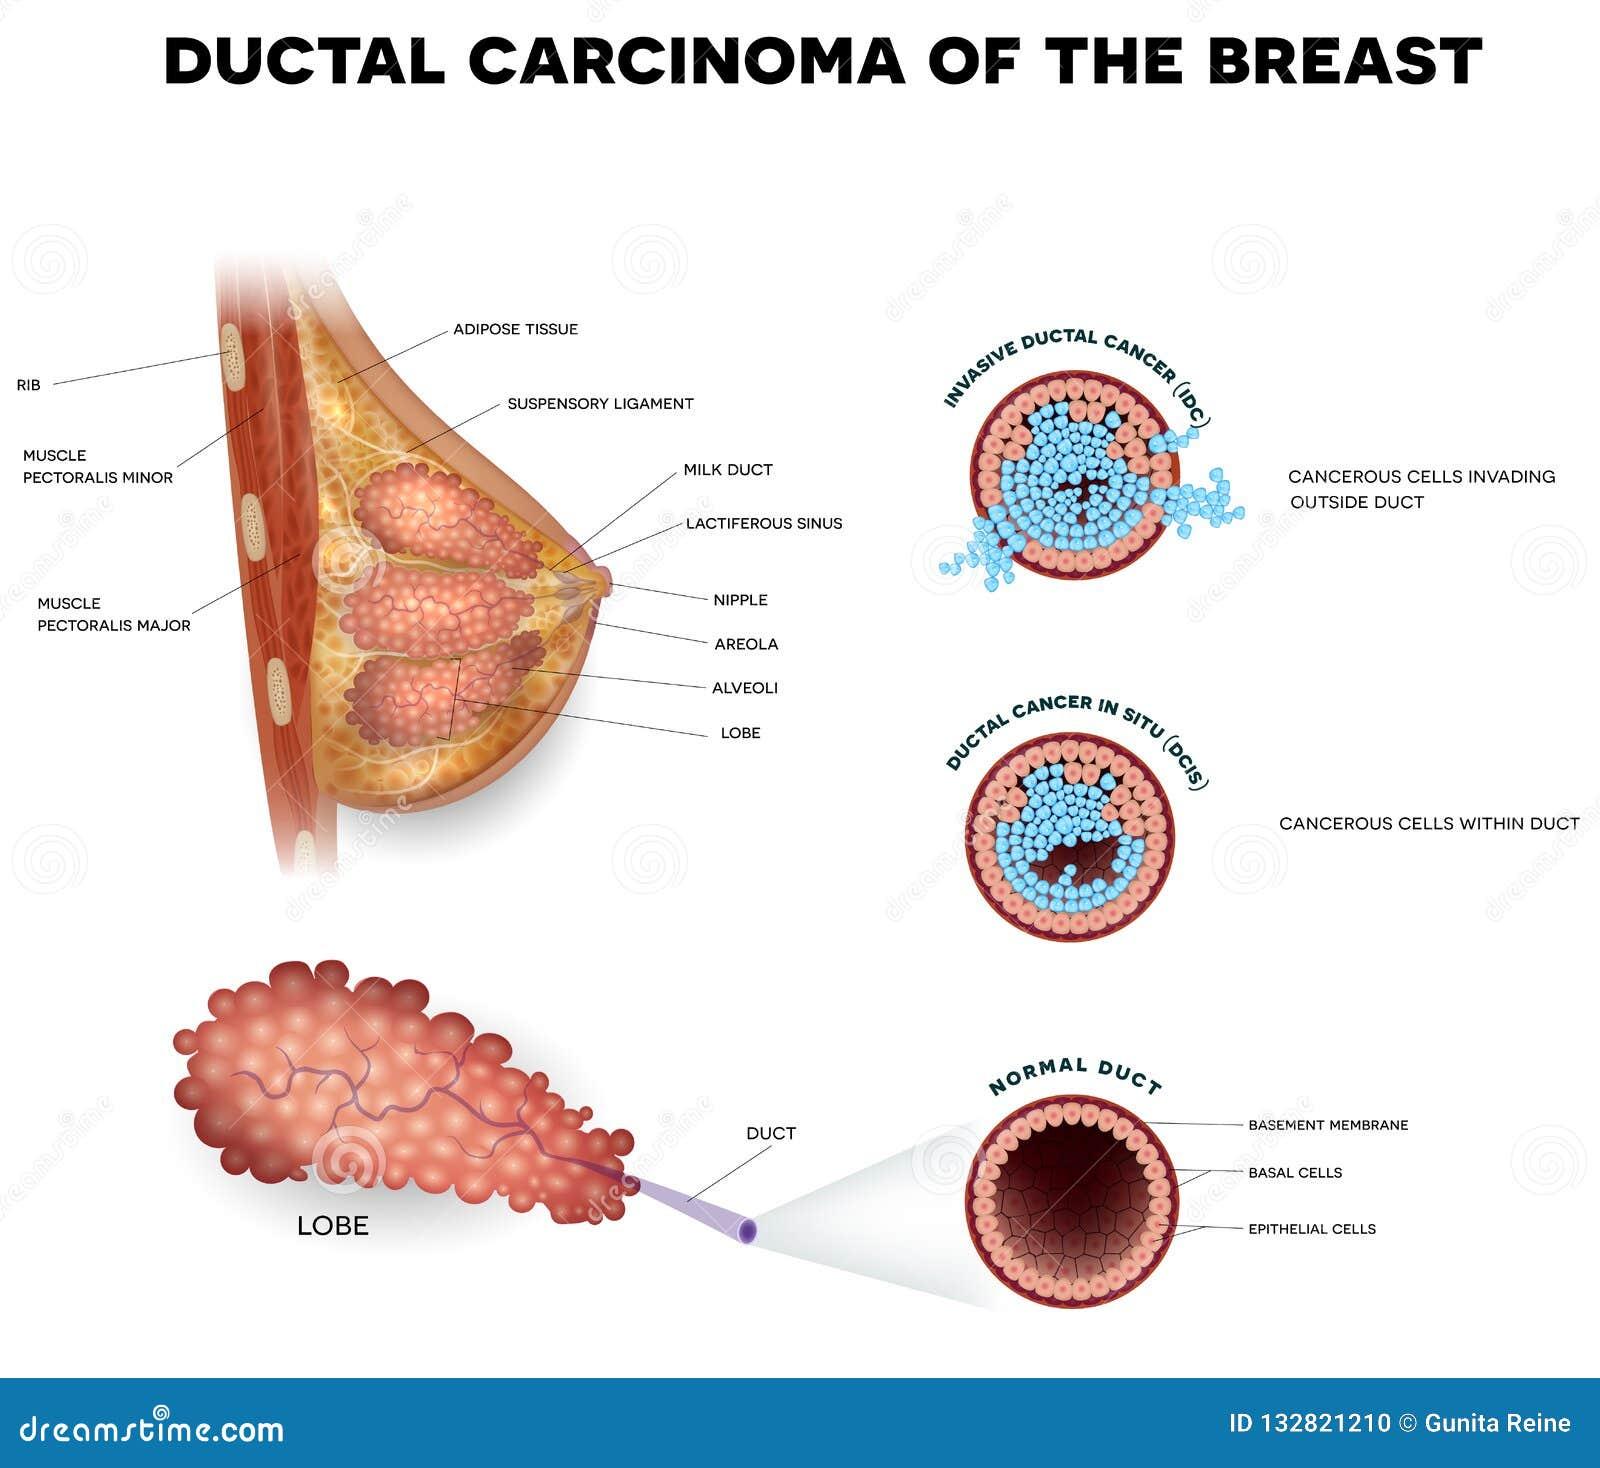 Ductal cancer